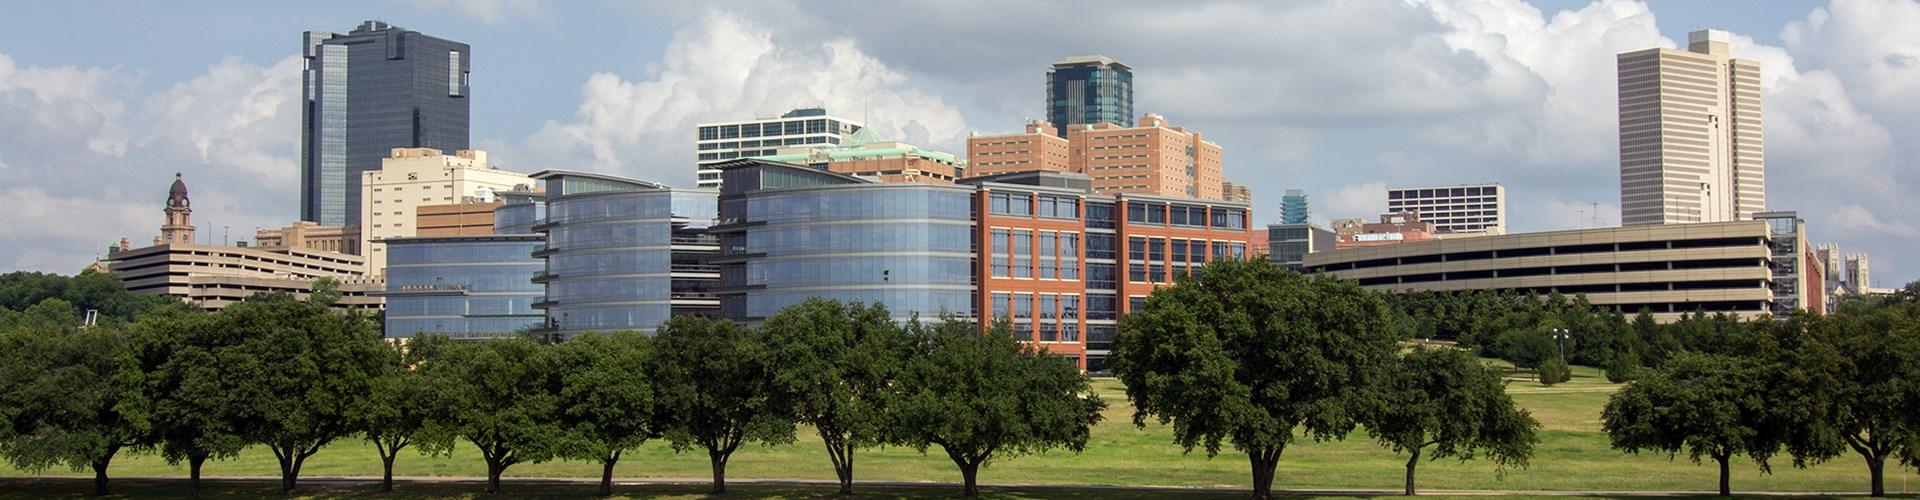 Fort Worth, Texas city skyline